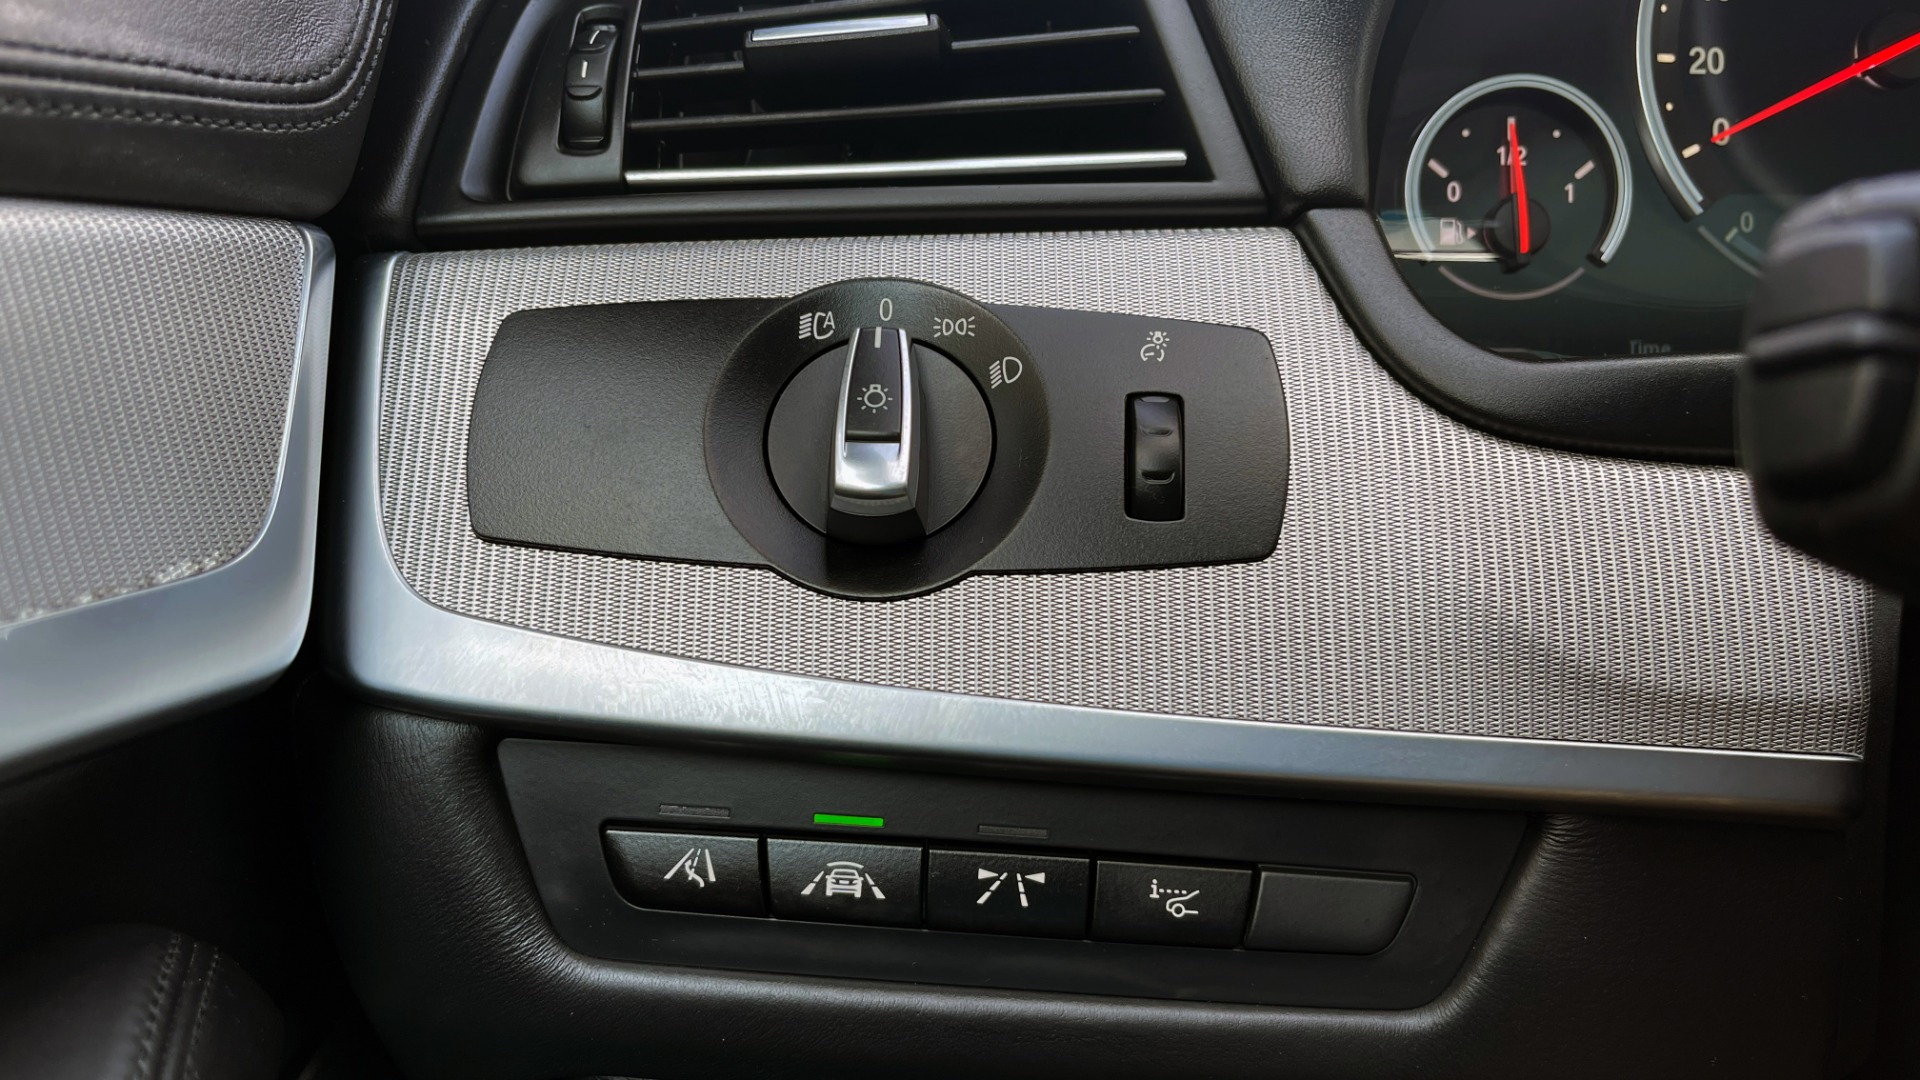 Used 2015 BMW M5 SEDAN / EXEC PKG / HUD / NAV / B&O SND / SUNROOF / REARVIEW for sale Sold at Formula Imports in Charlotte NC 28227 47